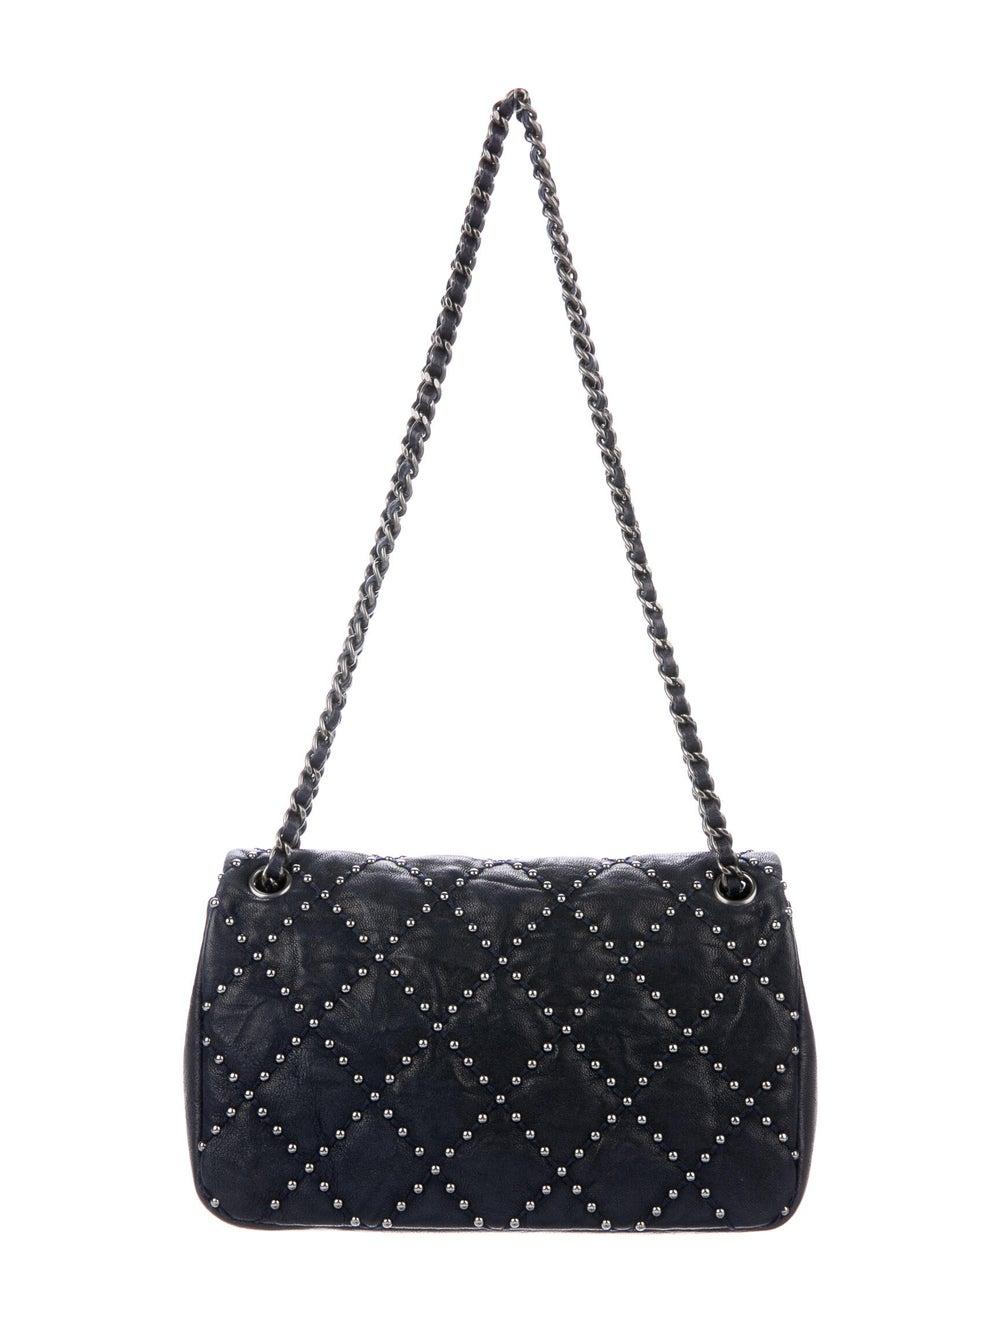 Chanel Metal Beauty Mini Flap Bag Blue - image 4